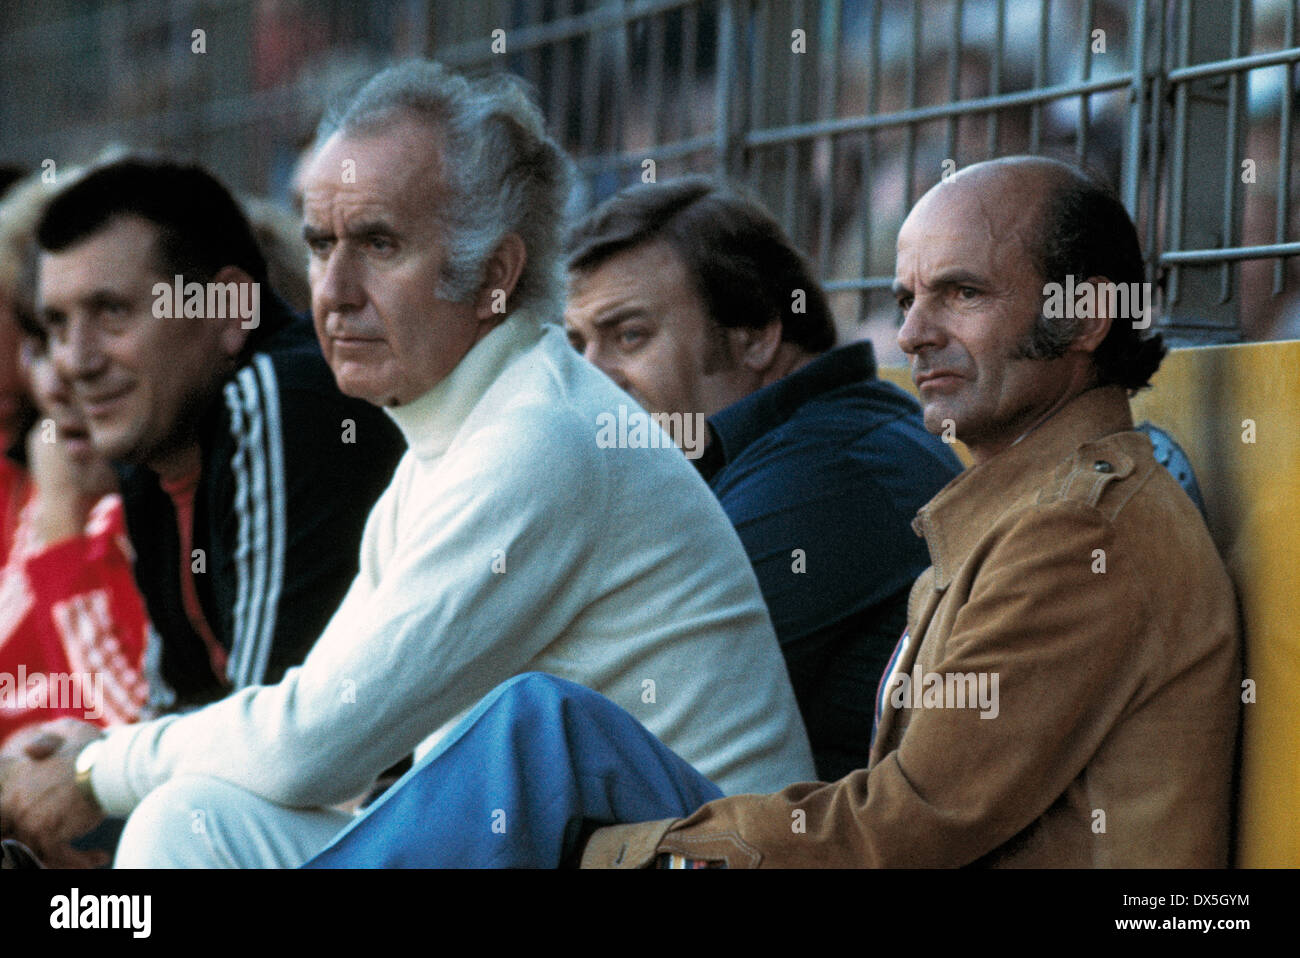 football, Bundesliga, 1975/1976, Stadium am Boekelberg, Borussia Moenchengladbach versus FC Bayern Munich 4:1, coaching bench Munich, director Robert Schwan (2.f.l.) and coach Dettmar Cramer (right) - Stock Image